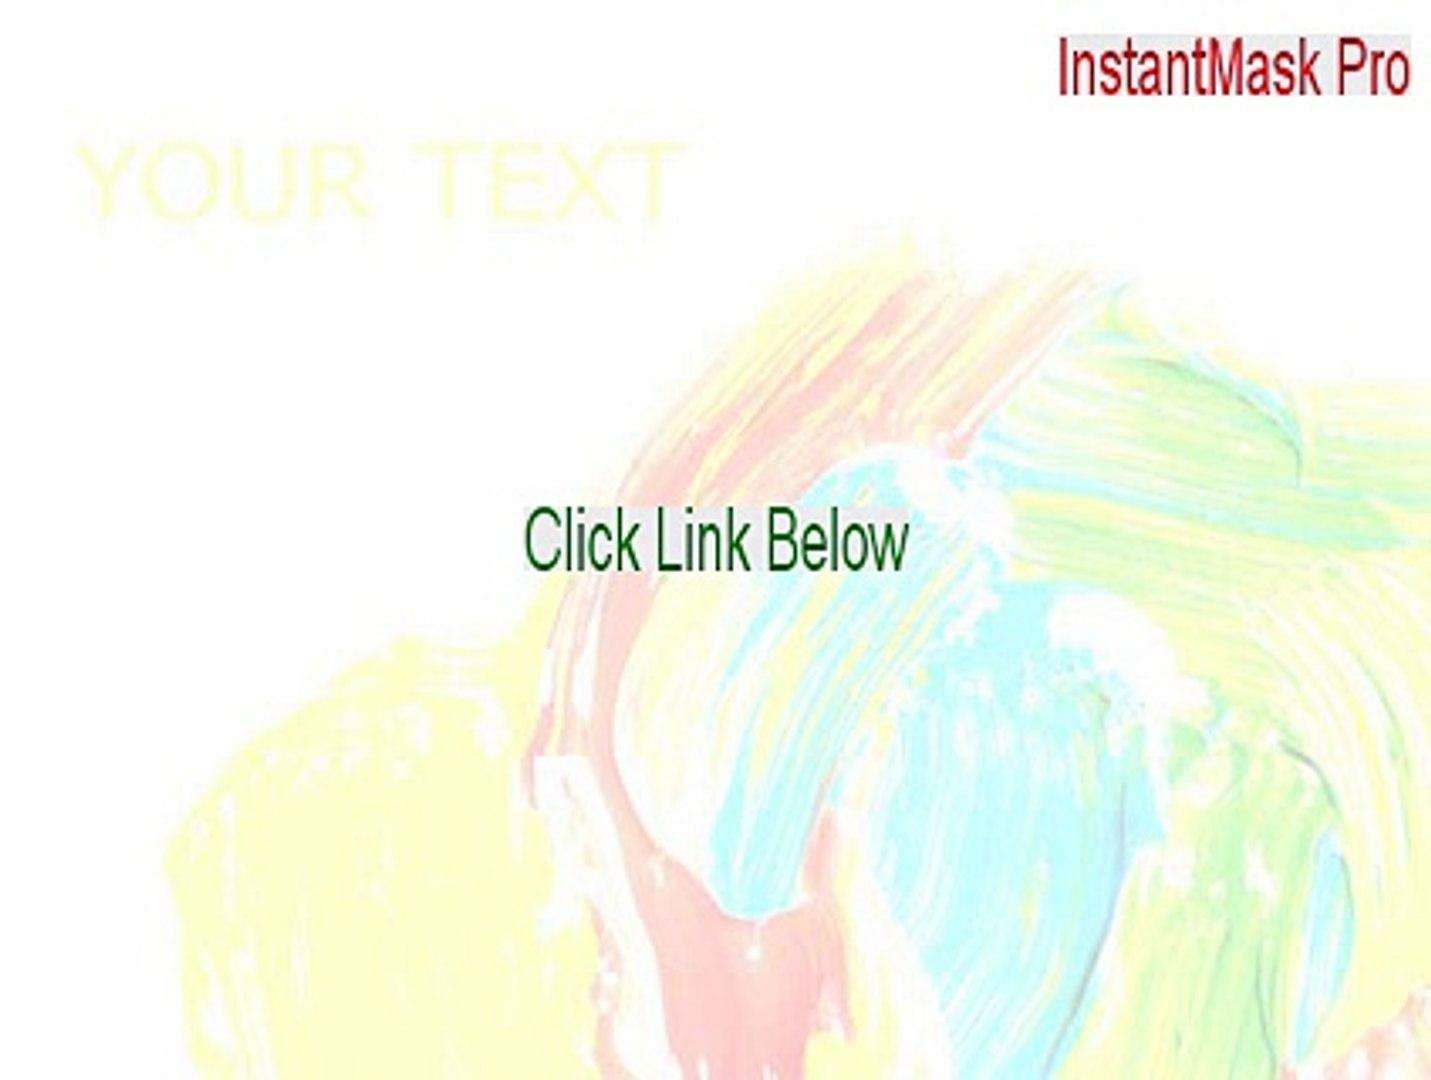 instantmask pro 2.8 crack